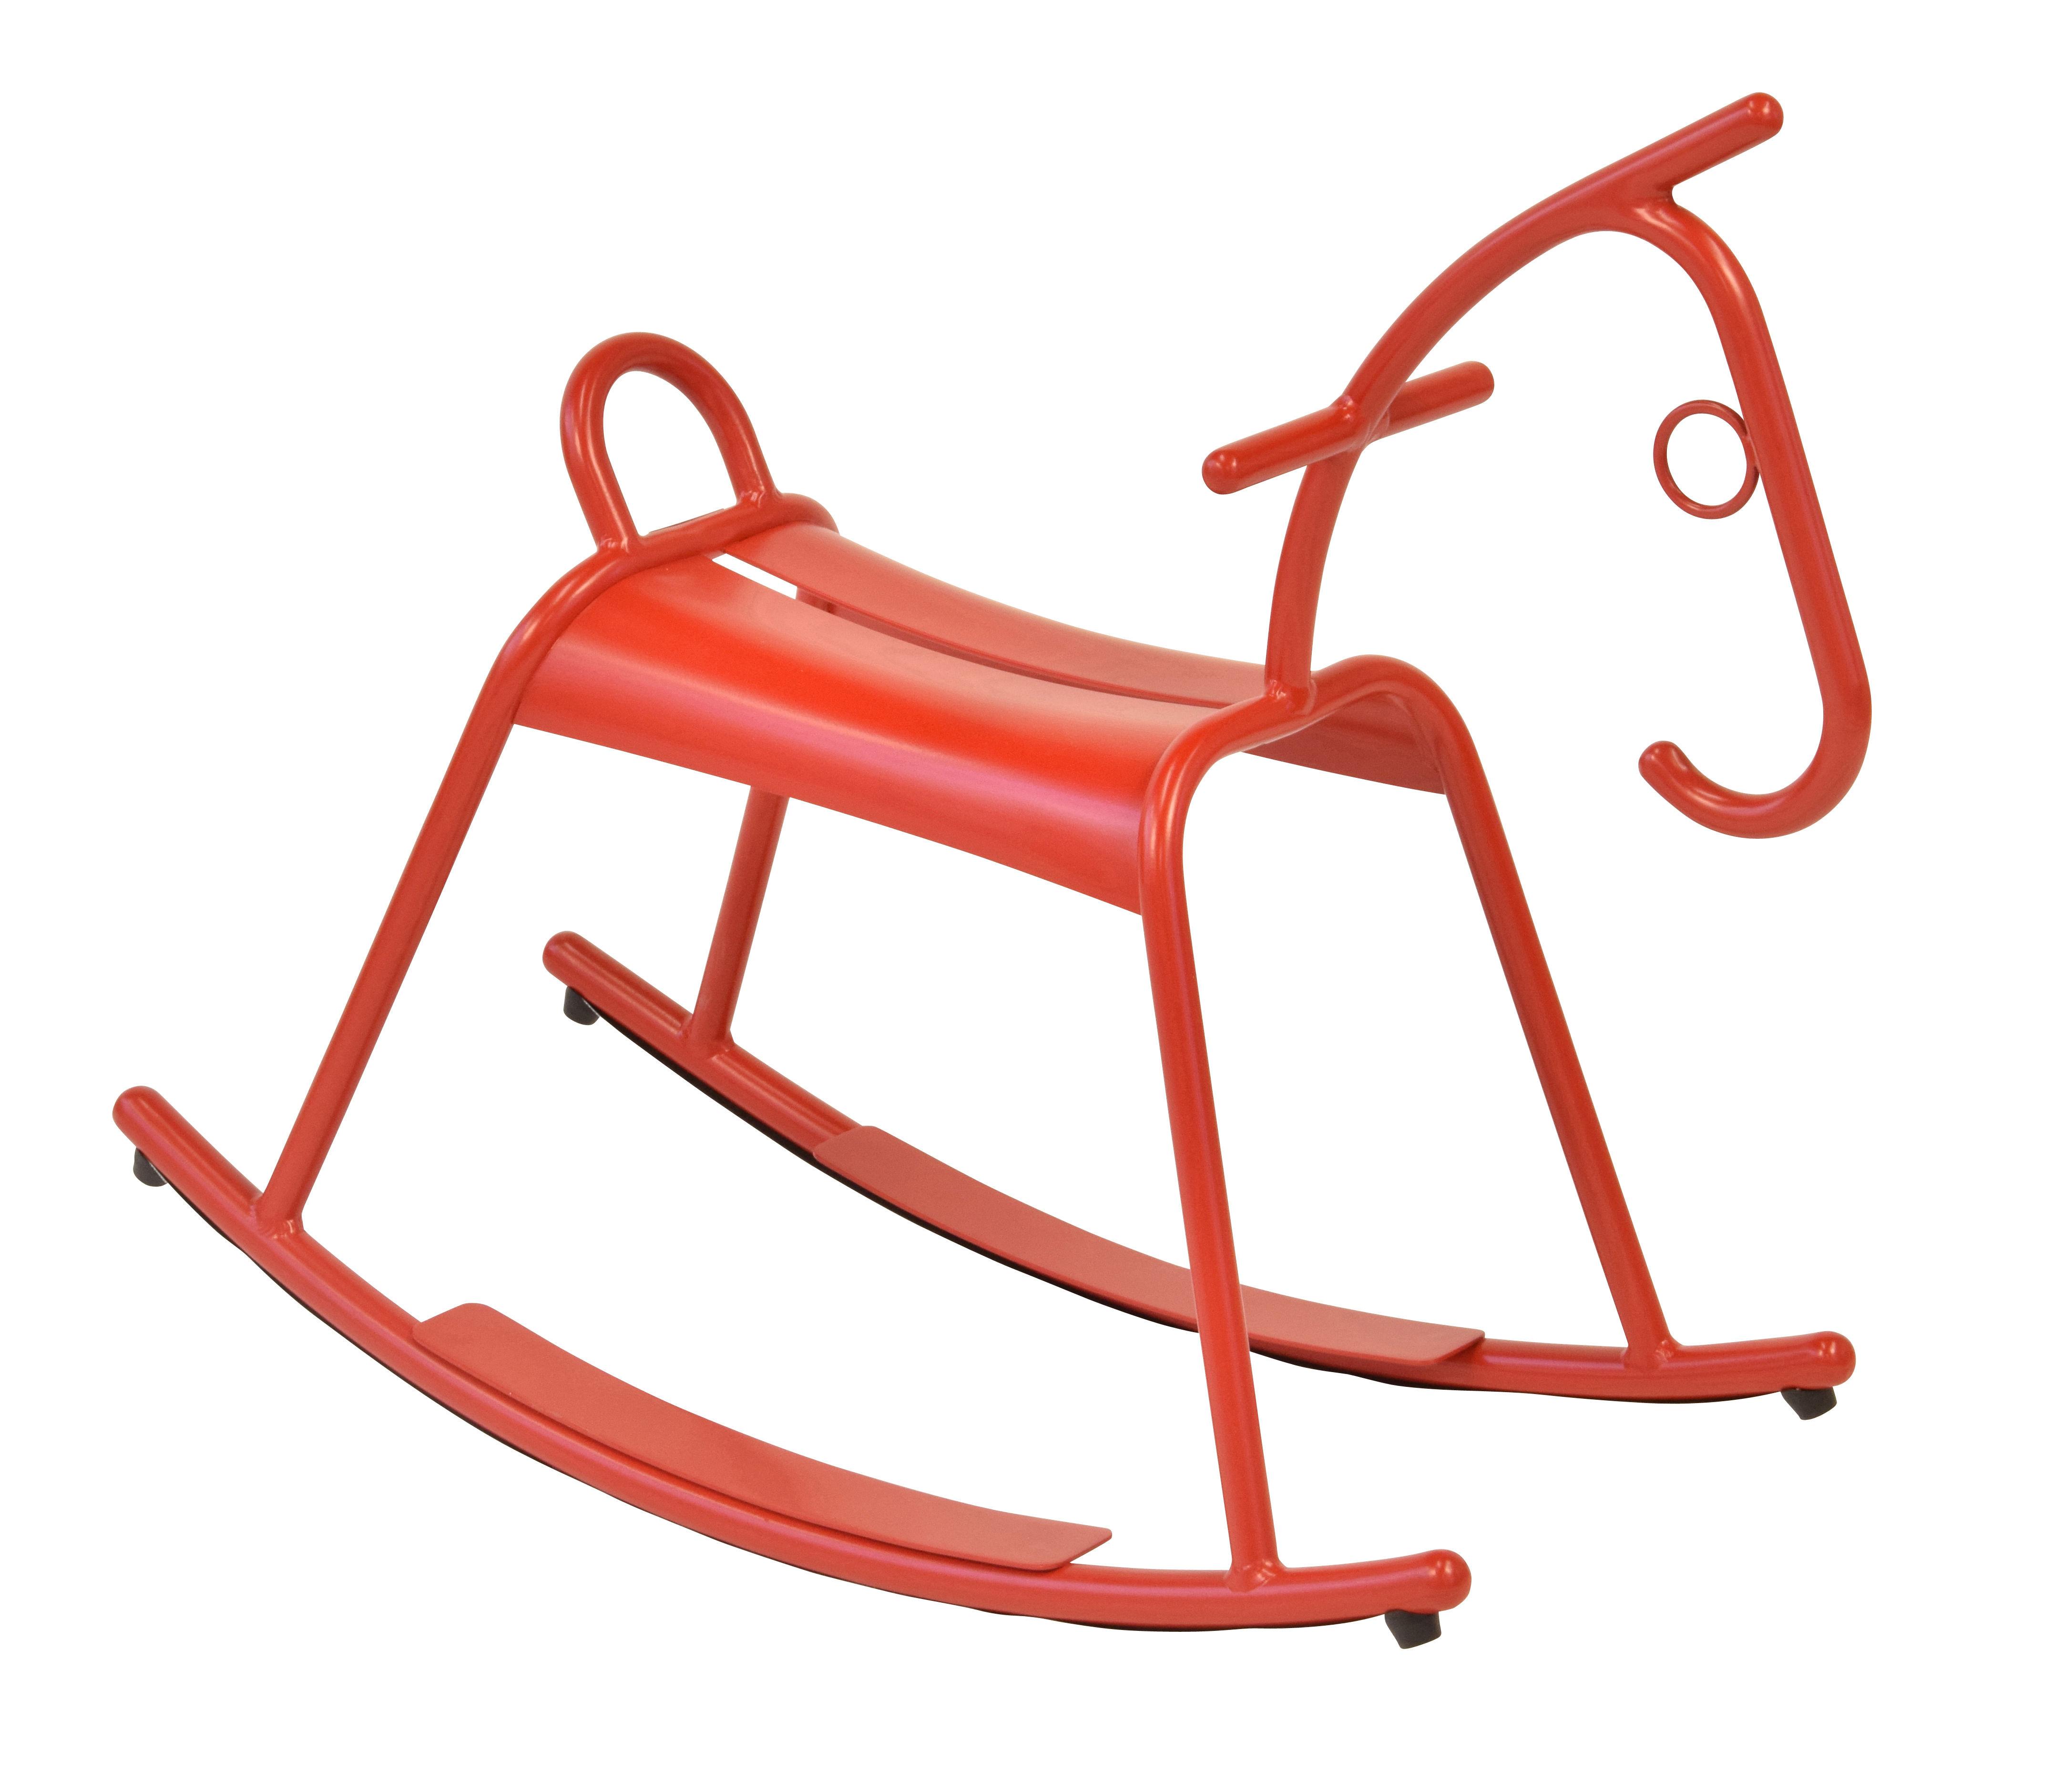 Furniture - Kids Furniture - Adada Rocking horse - Outdoor by Fermob - Poppy - Aluminium